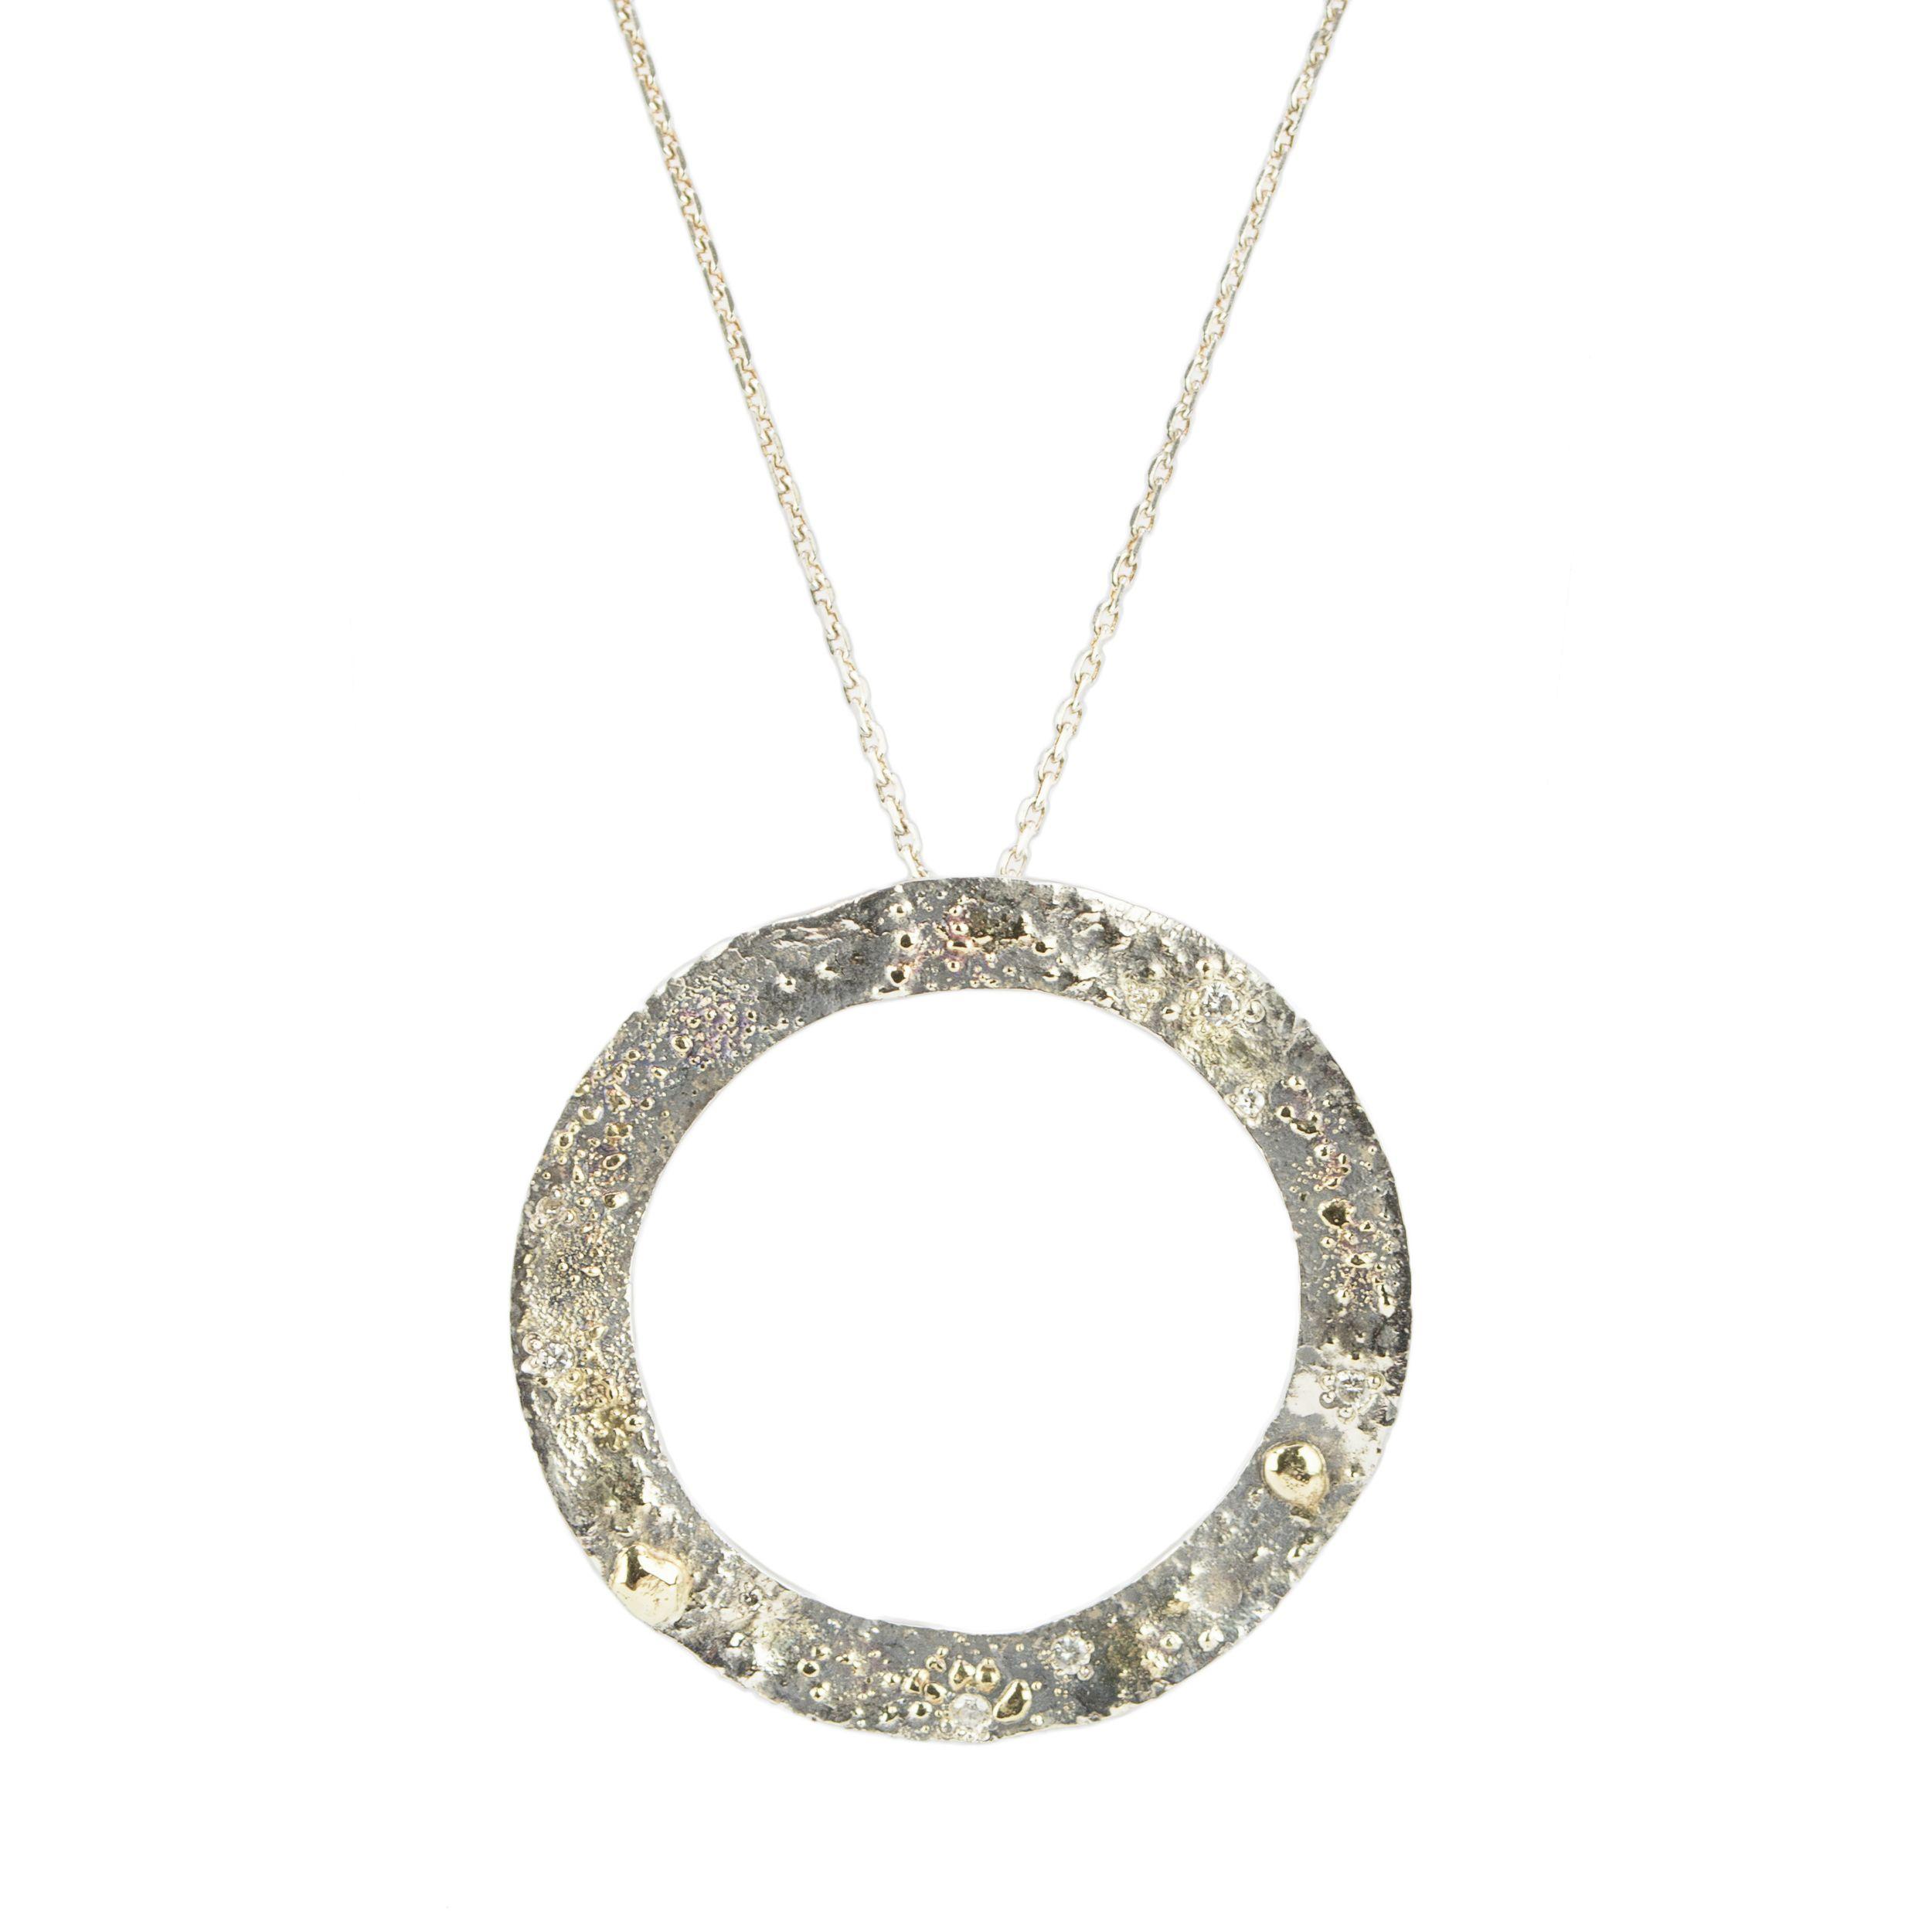 Gold Fusion Circle Pendant with Diamonds  http://www.rhoadsjewelry.com/online-store/gold-fusion-circle-pendant-with-diamonds